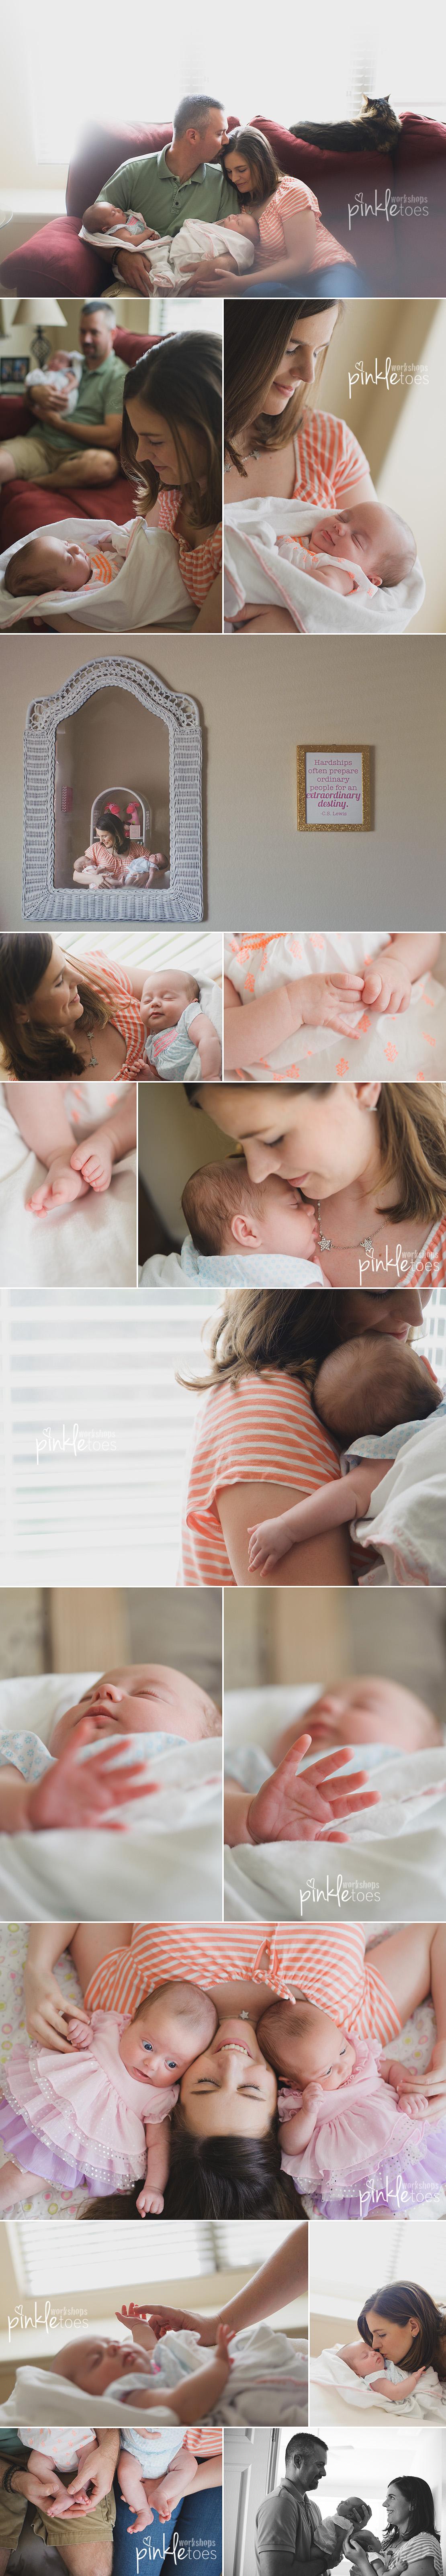 twins-newborn-austin-lifestyle-photography-workshop-texas-sydney-australia